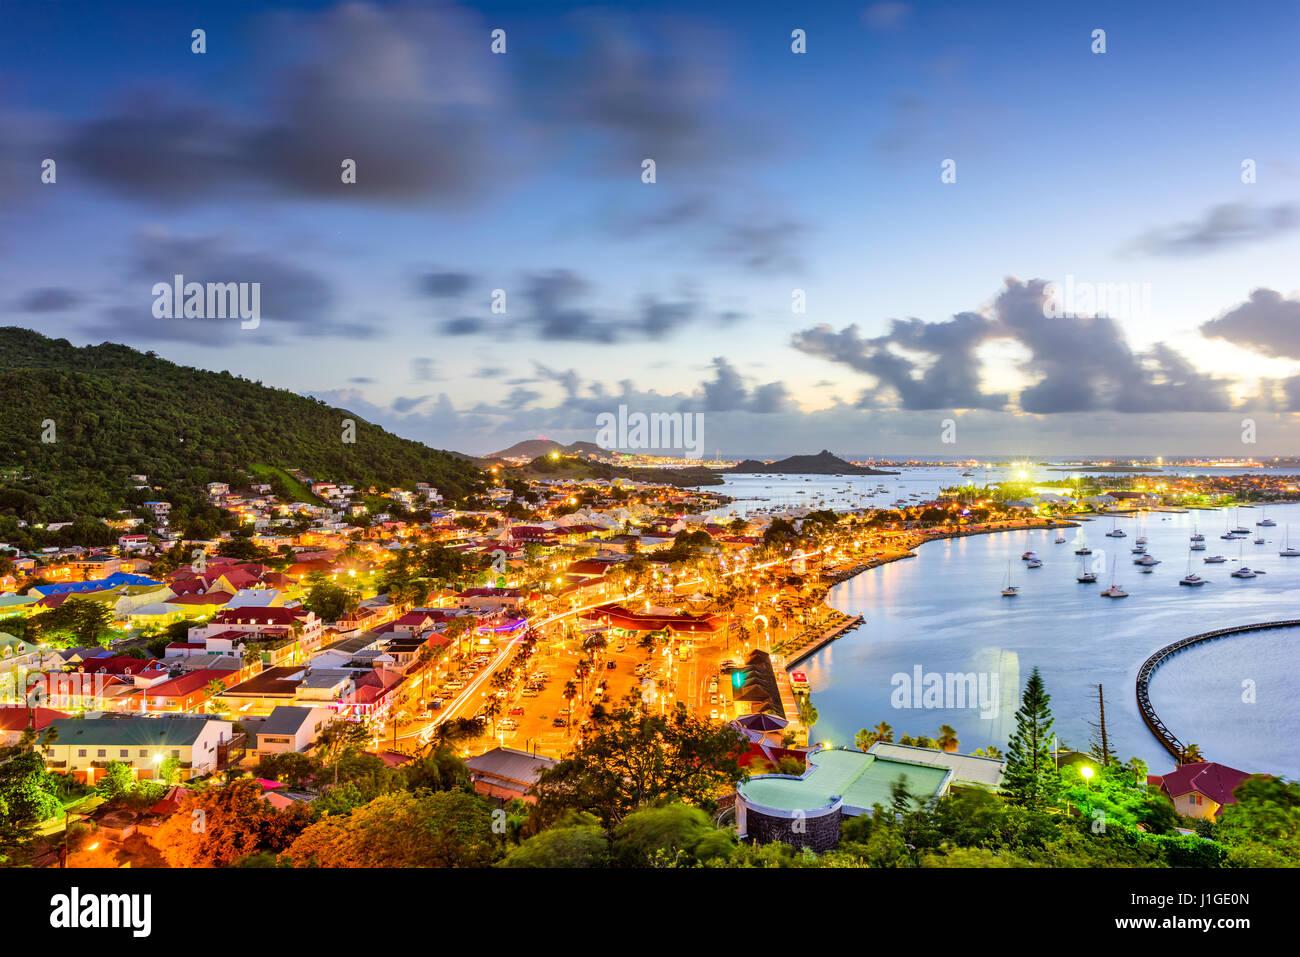 Marigot, St. Martin town skyline. - Stock Image